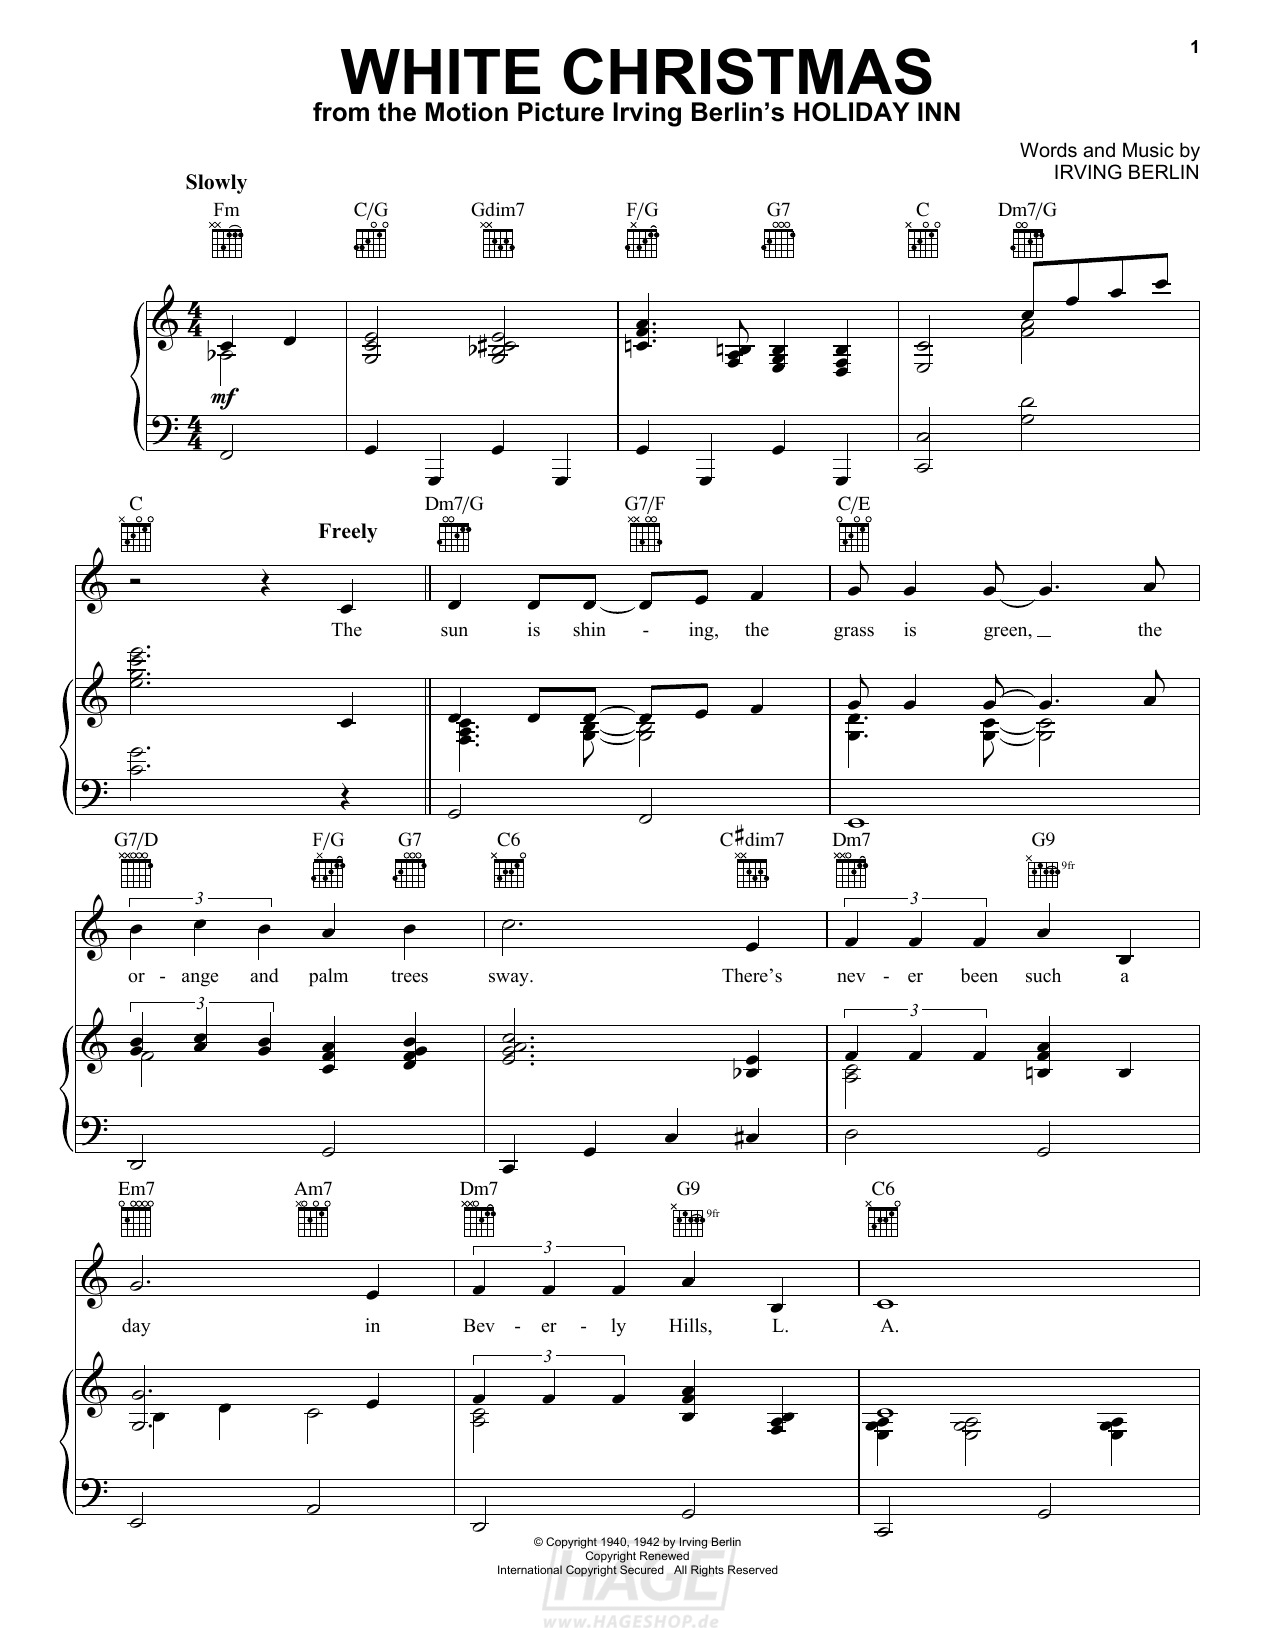 White Christmas - Irving Berlin - Noten Druckvorschau